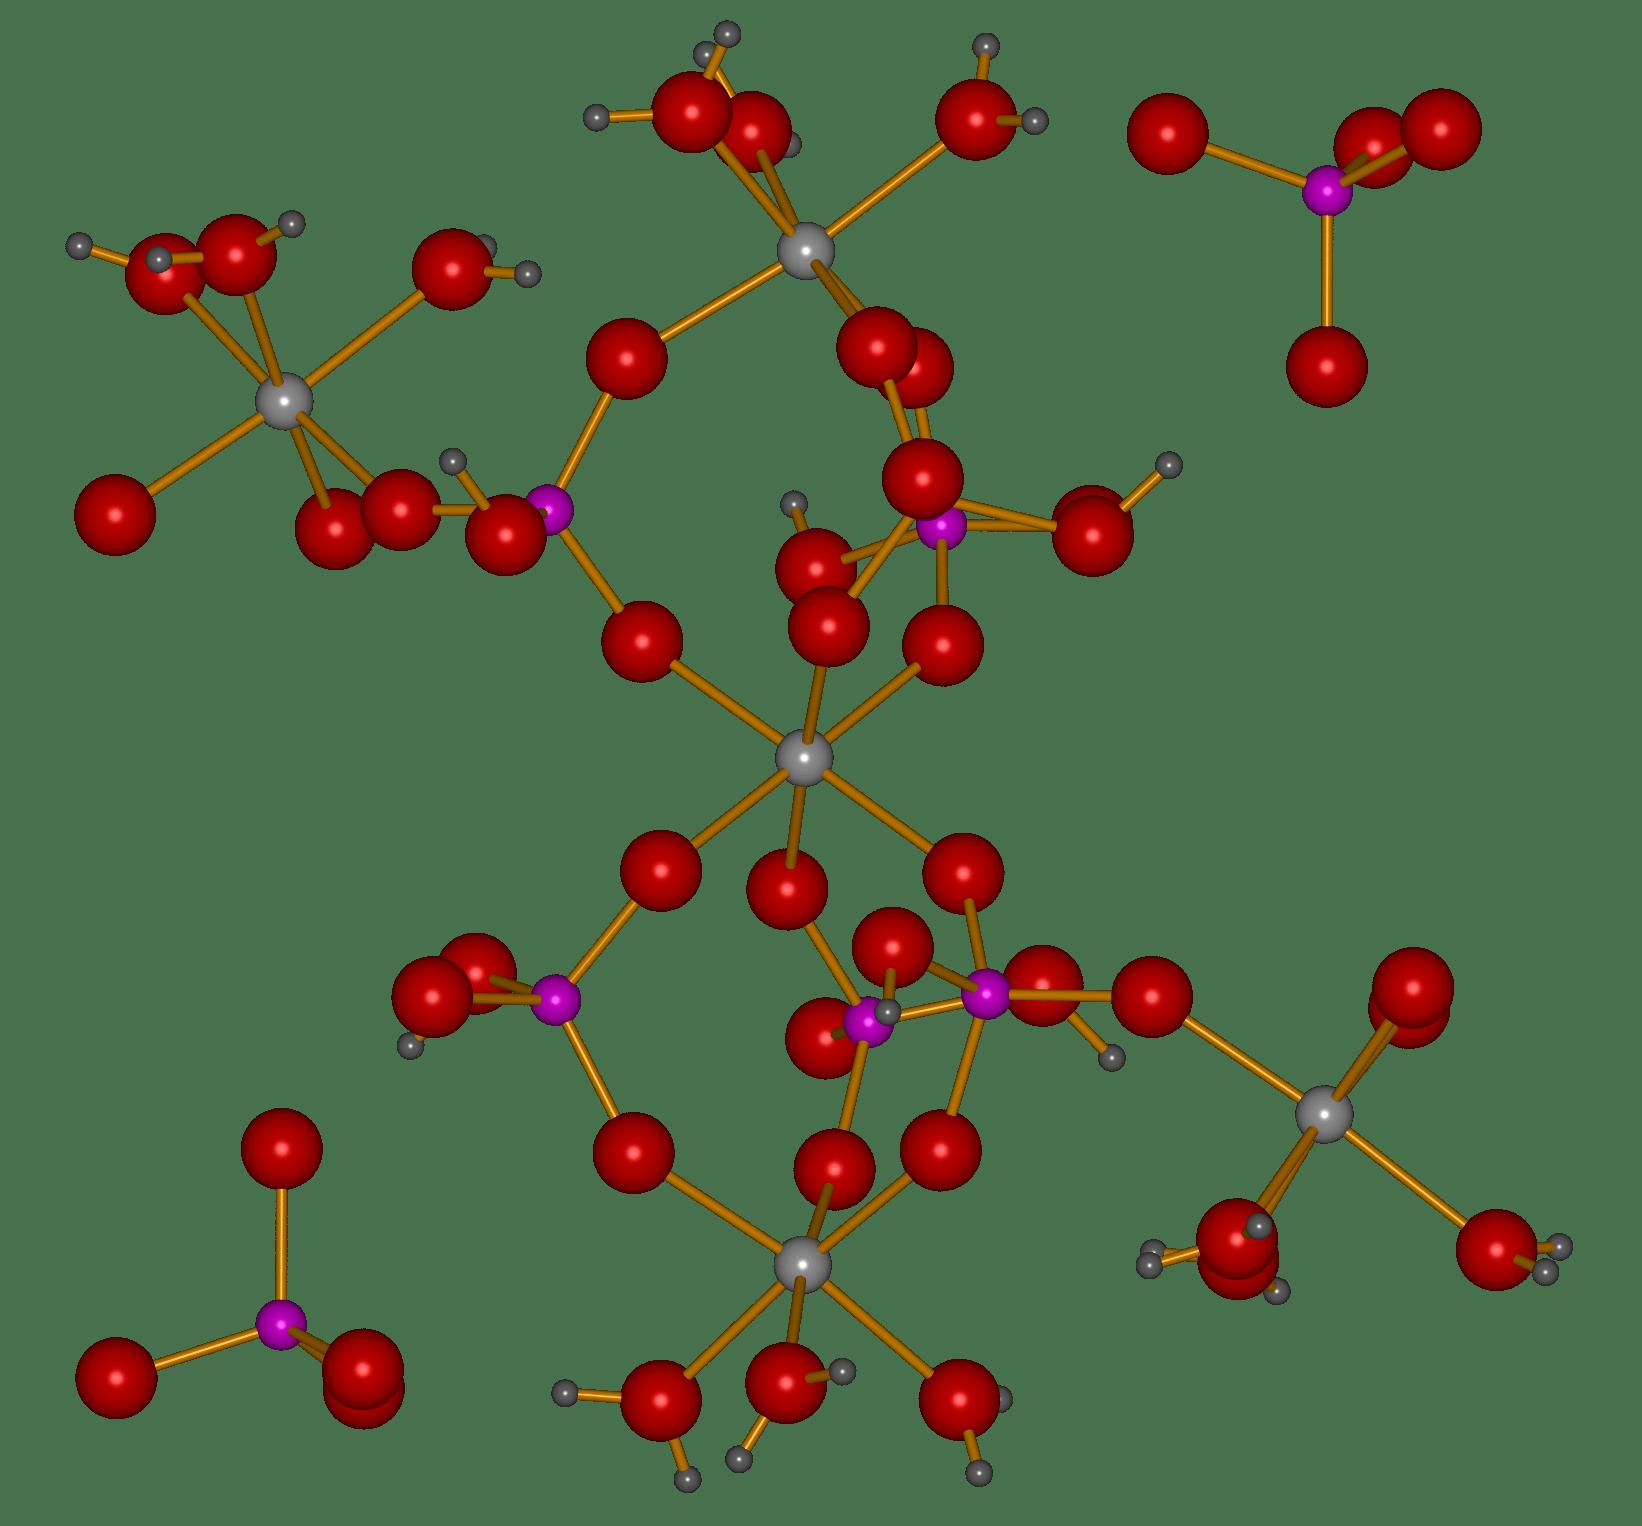 electron dot diagram for al 12 volt relay wiring po4 related keywords long tail keywordsking